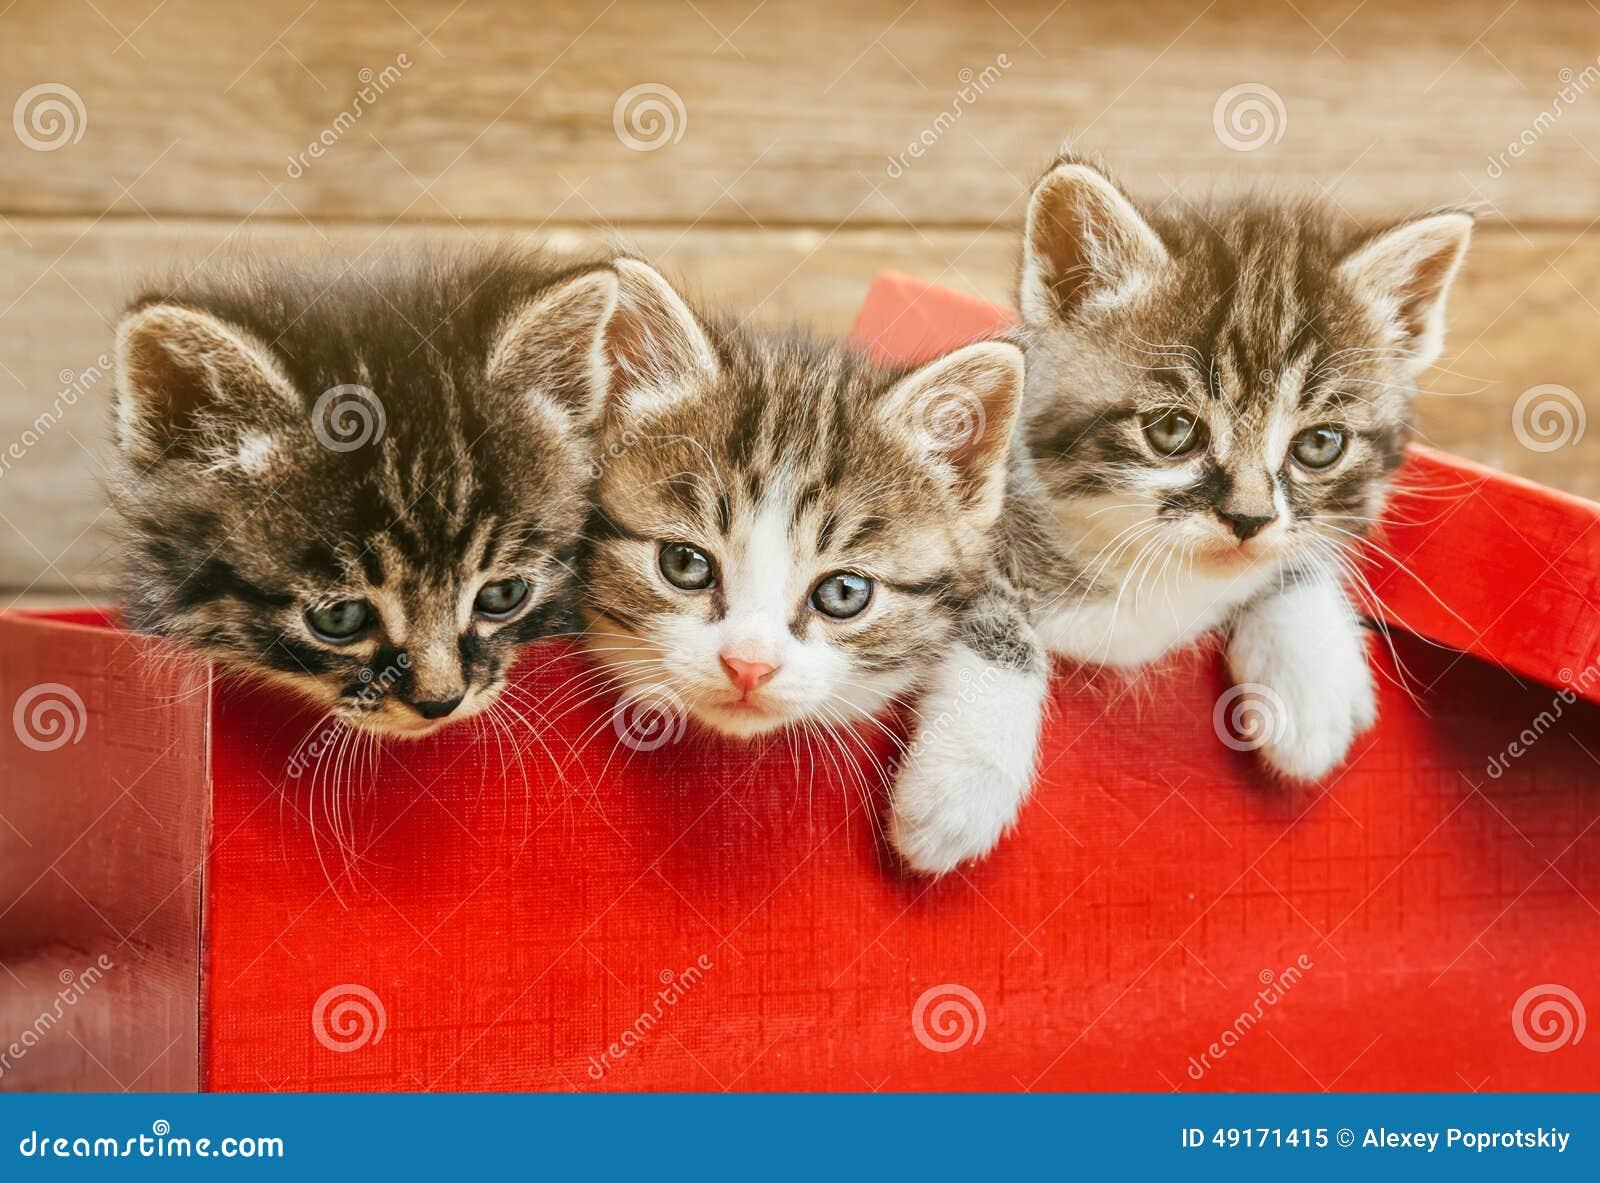 Three kittens sitting in a red box